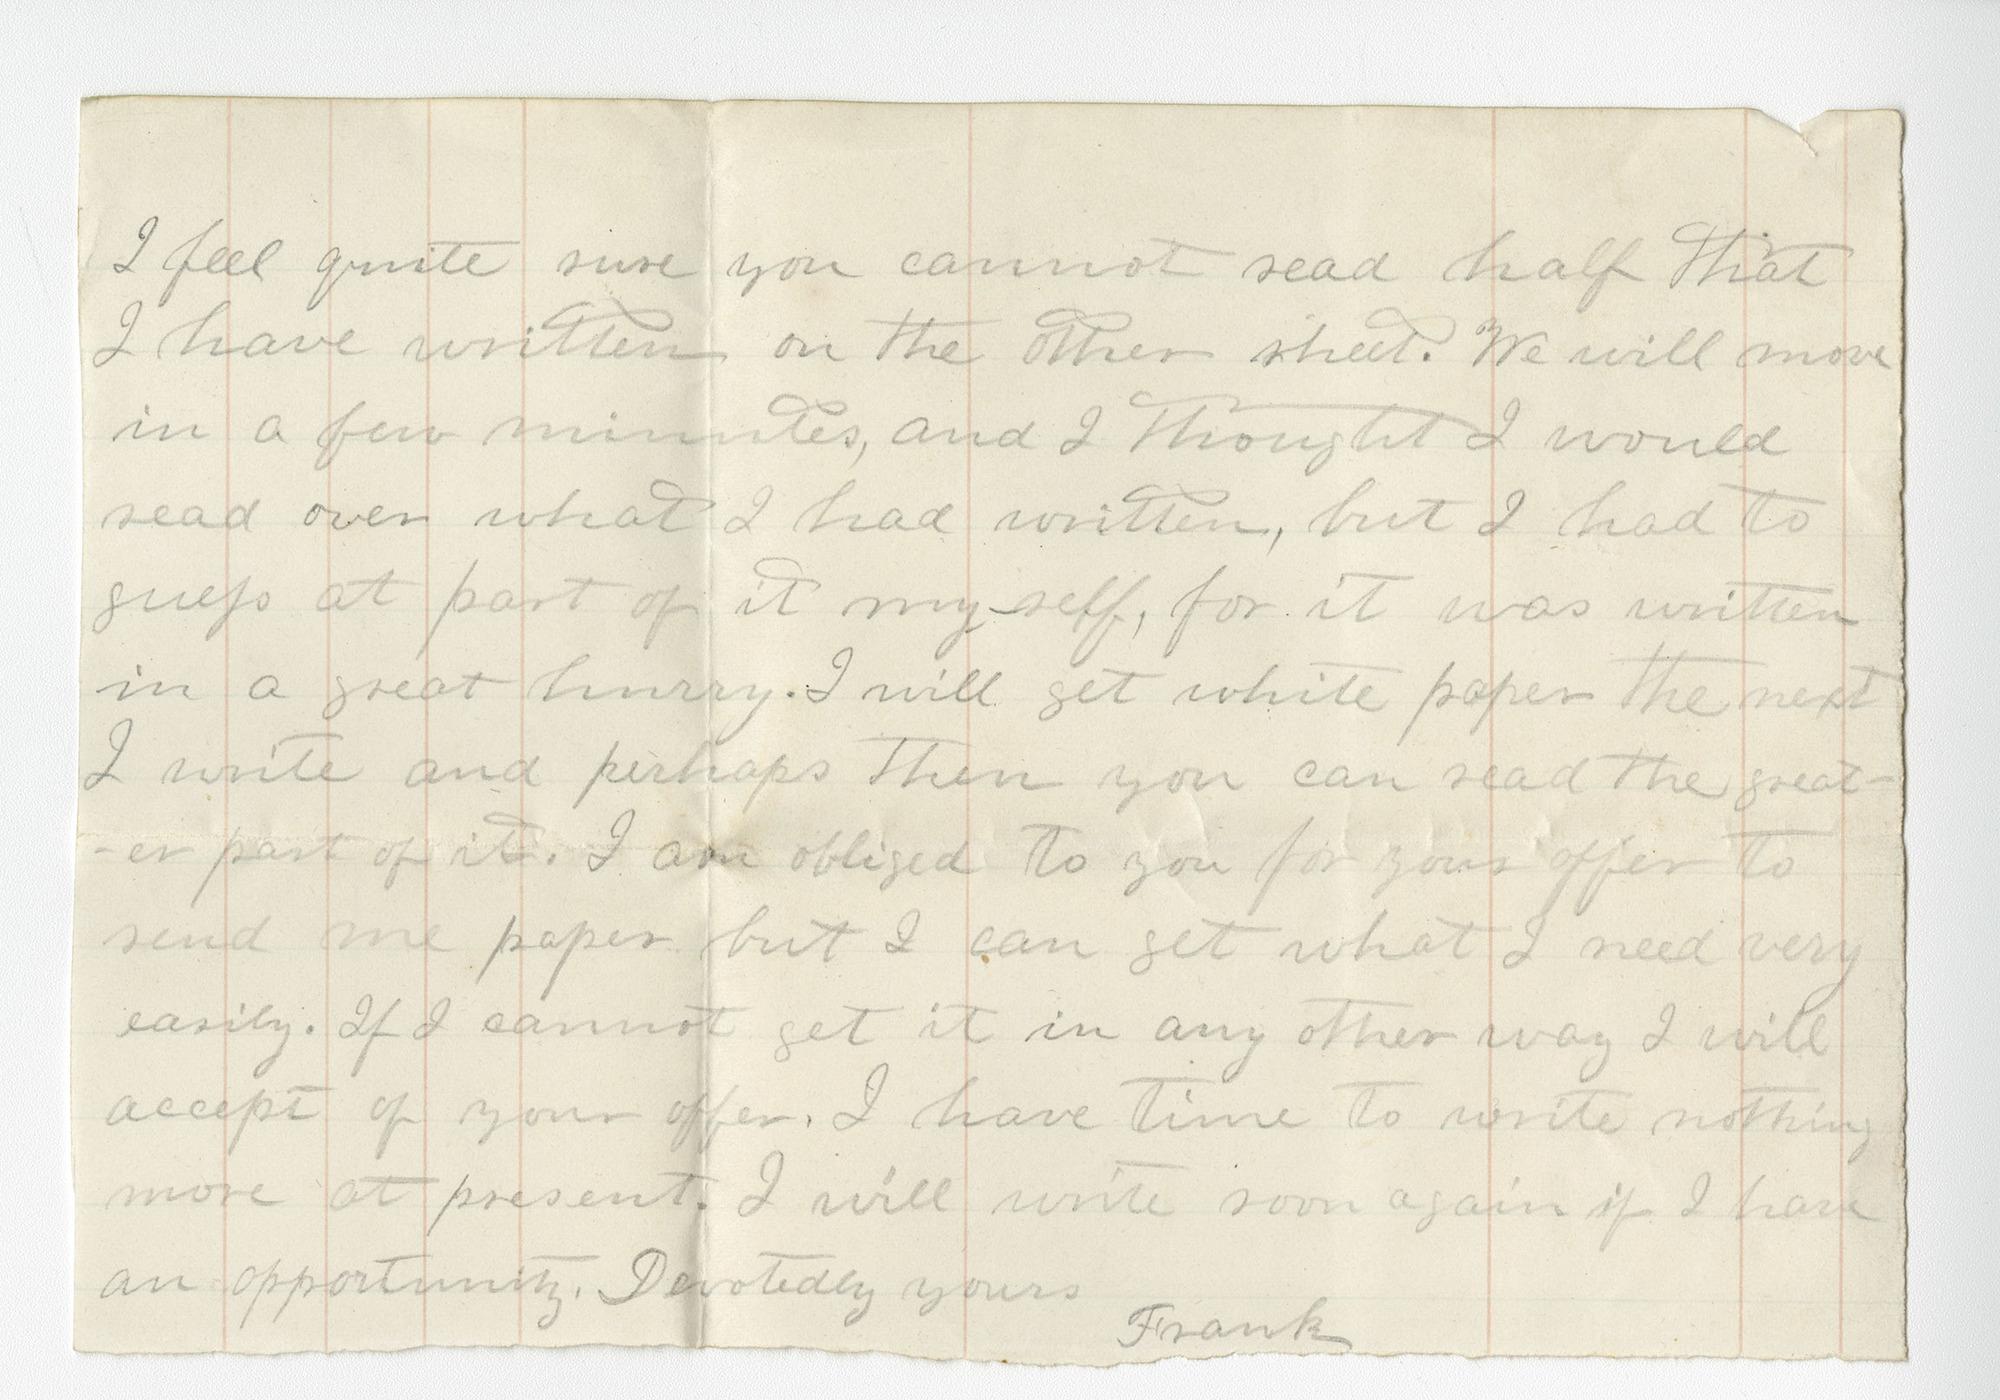 Ms2016-013_HeizerJames_Letter_NoDate_E.jpg